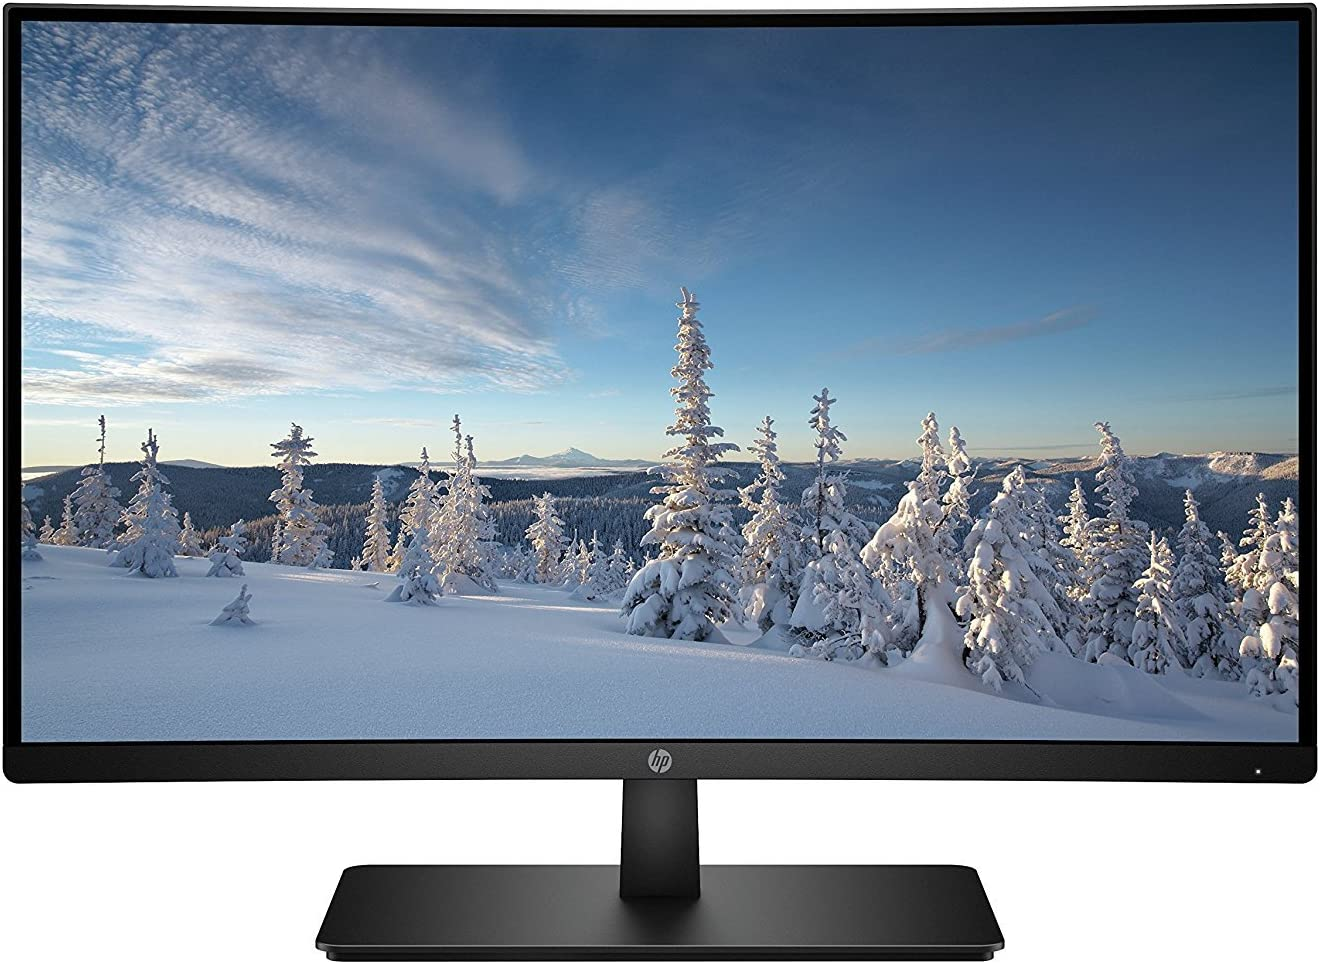 HP 27-inch FHD Curved Monitor with AMD Freesync Technology (27b, Black)